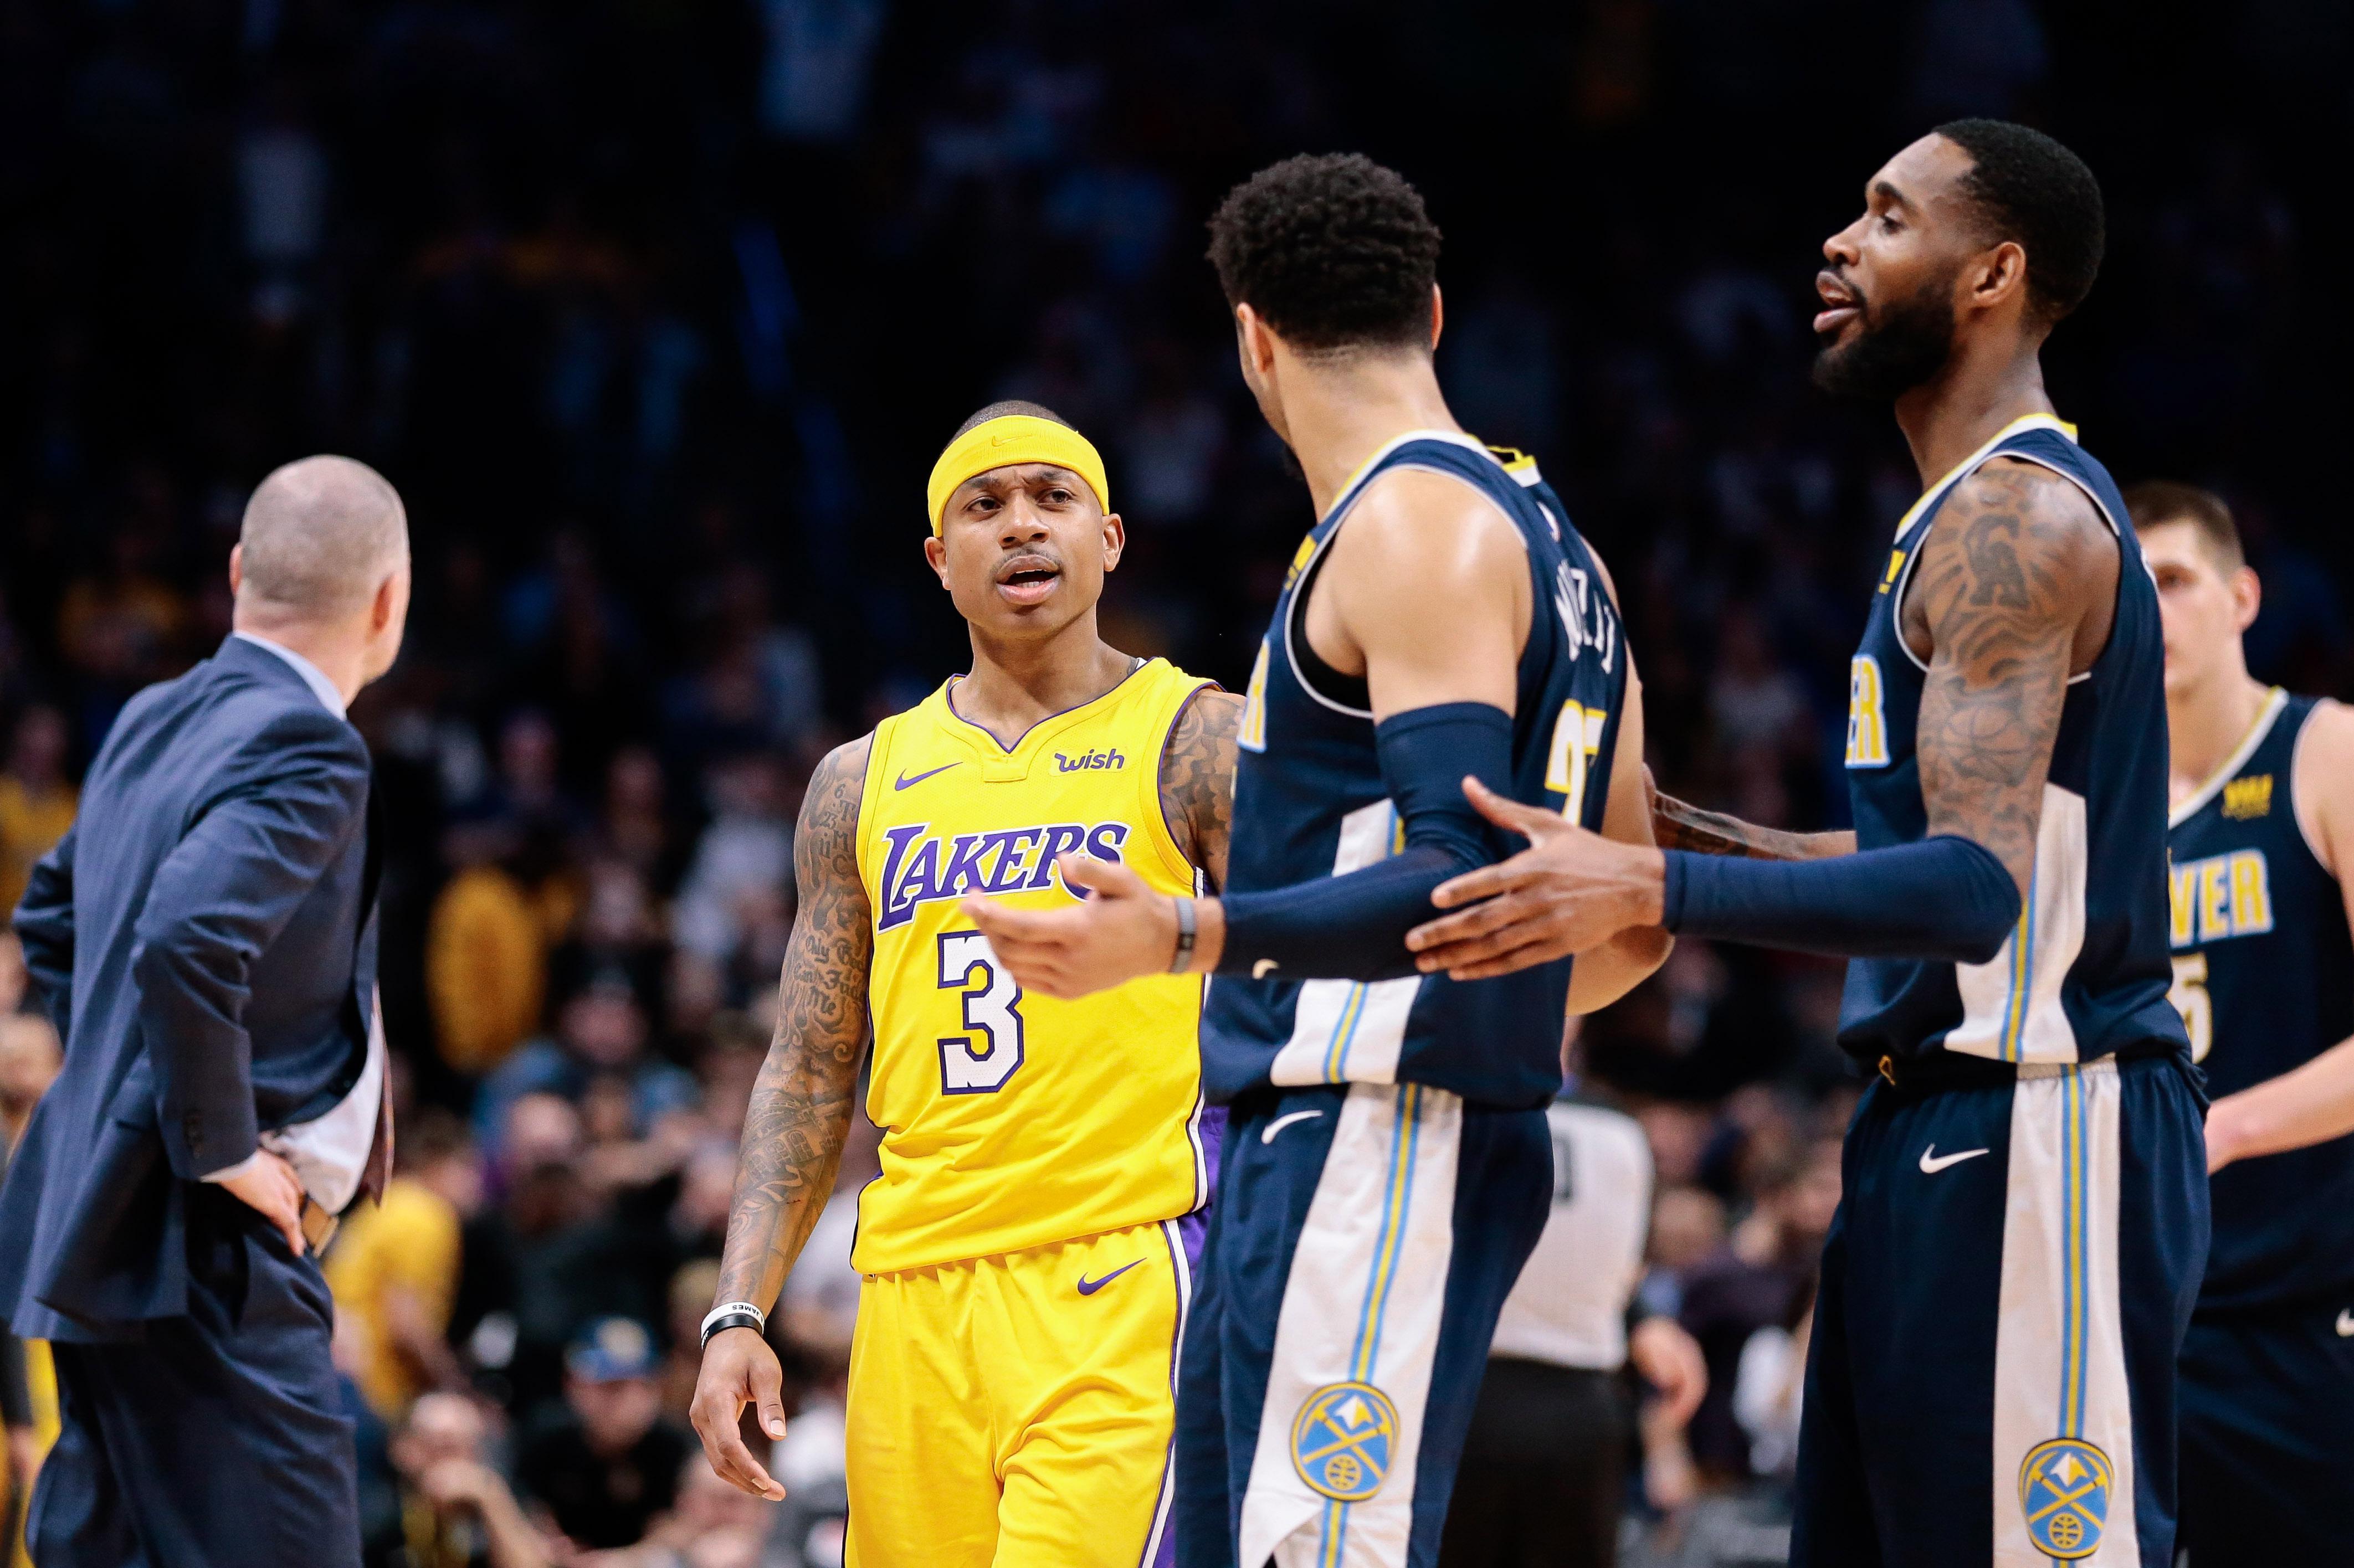 Denver Nuggets forward Will Barton (5) separates guard Jamal Murray (27) from Los Angeles Lakers guard Isaiah Thomas (3) after the game at the Pepsi Center.